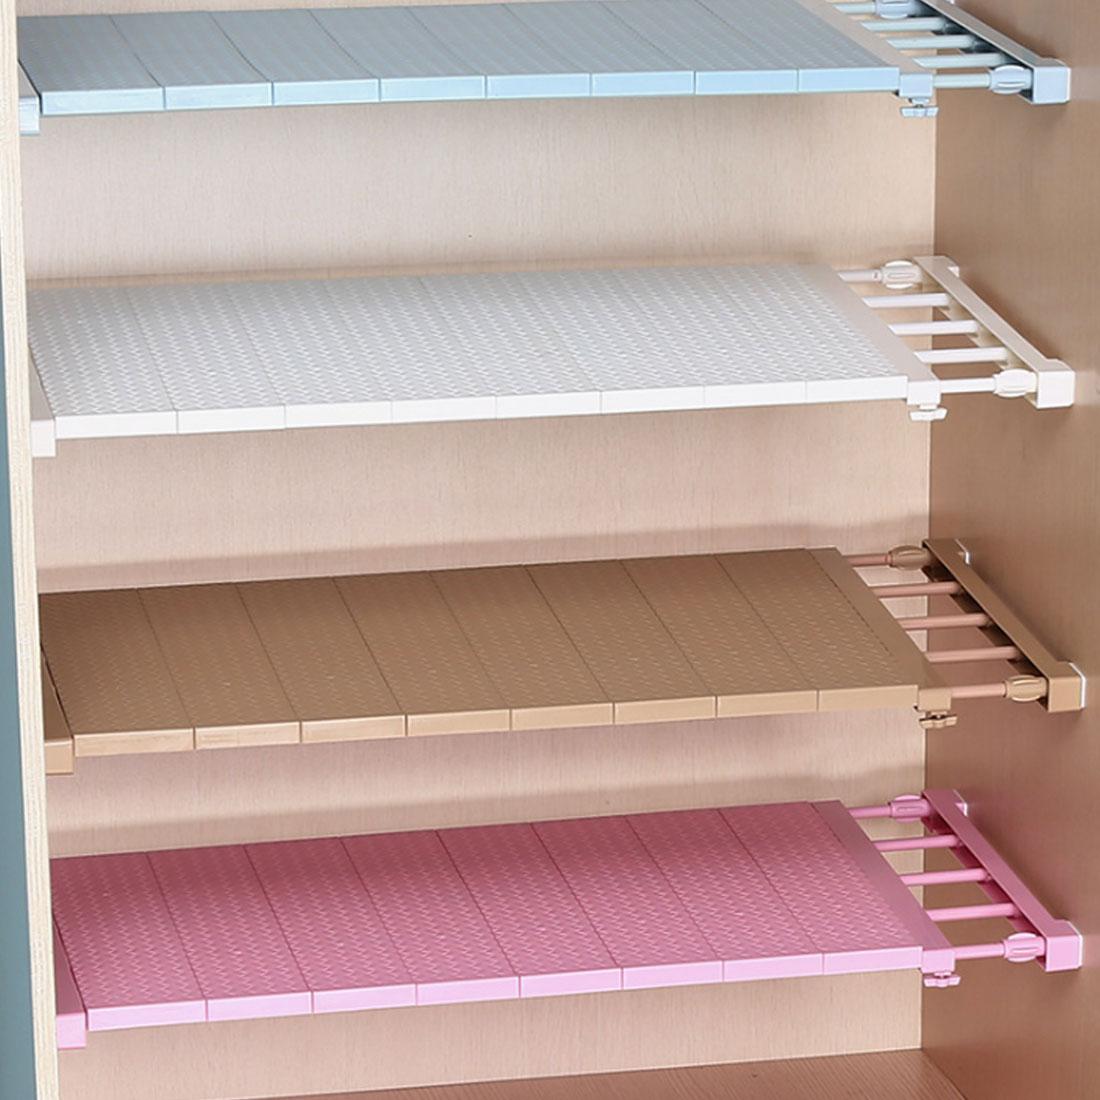 Adjustable Closet Organizer Storage Shelf Wall  Decorative Shelves Cabinet Mounted Kitchen Rack Space Saving Wardrobe